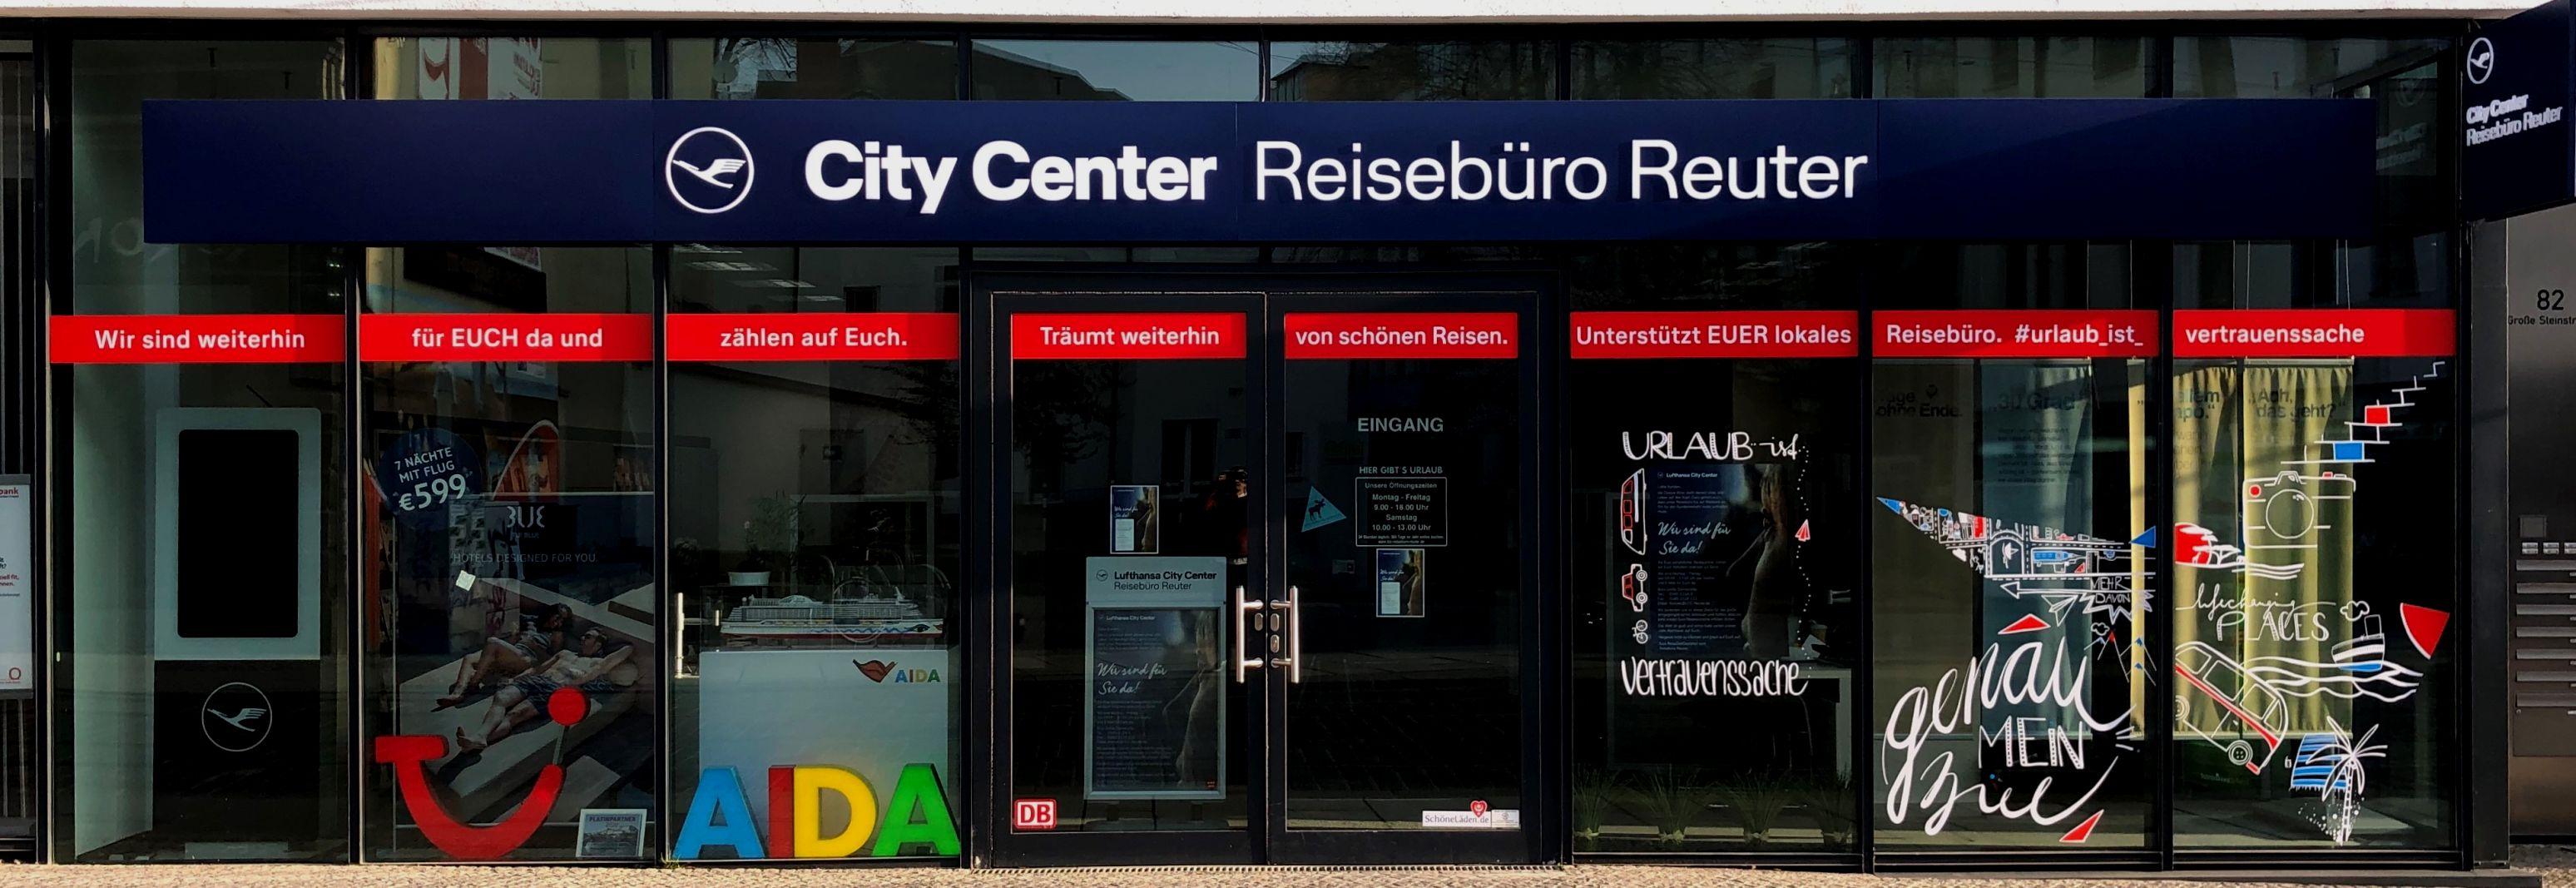 Reisebüro Reuter Lufthansa City Center